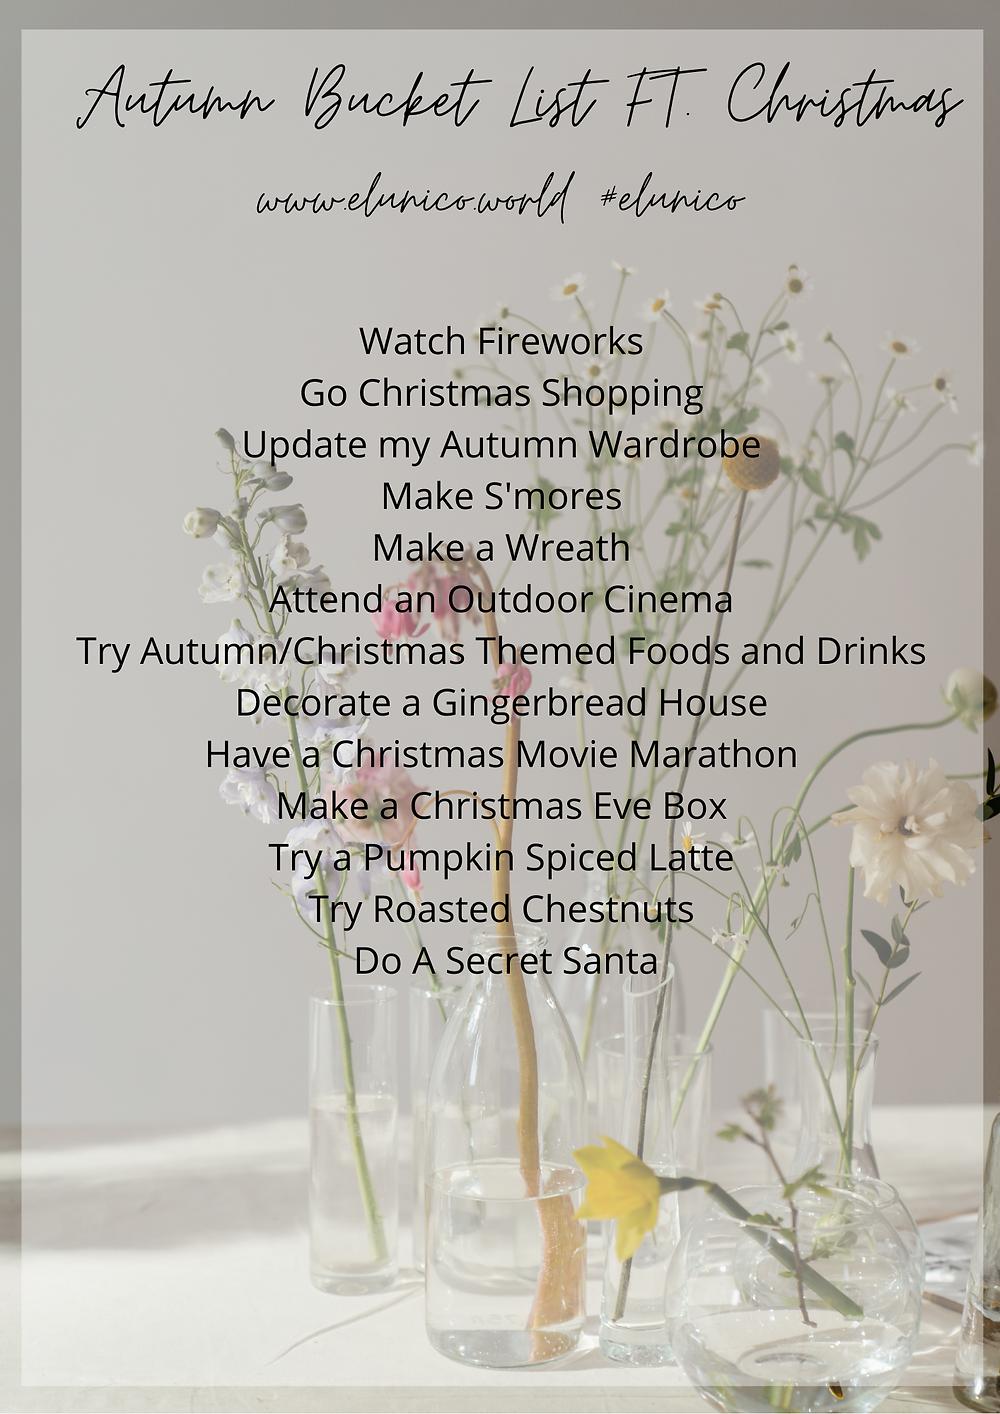 el unico, el unico blog, elunico, autumn, bucket list, christmas, november, fireworks, chestnuts, snow, to do, how to